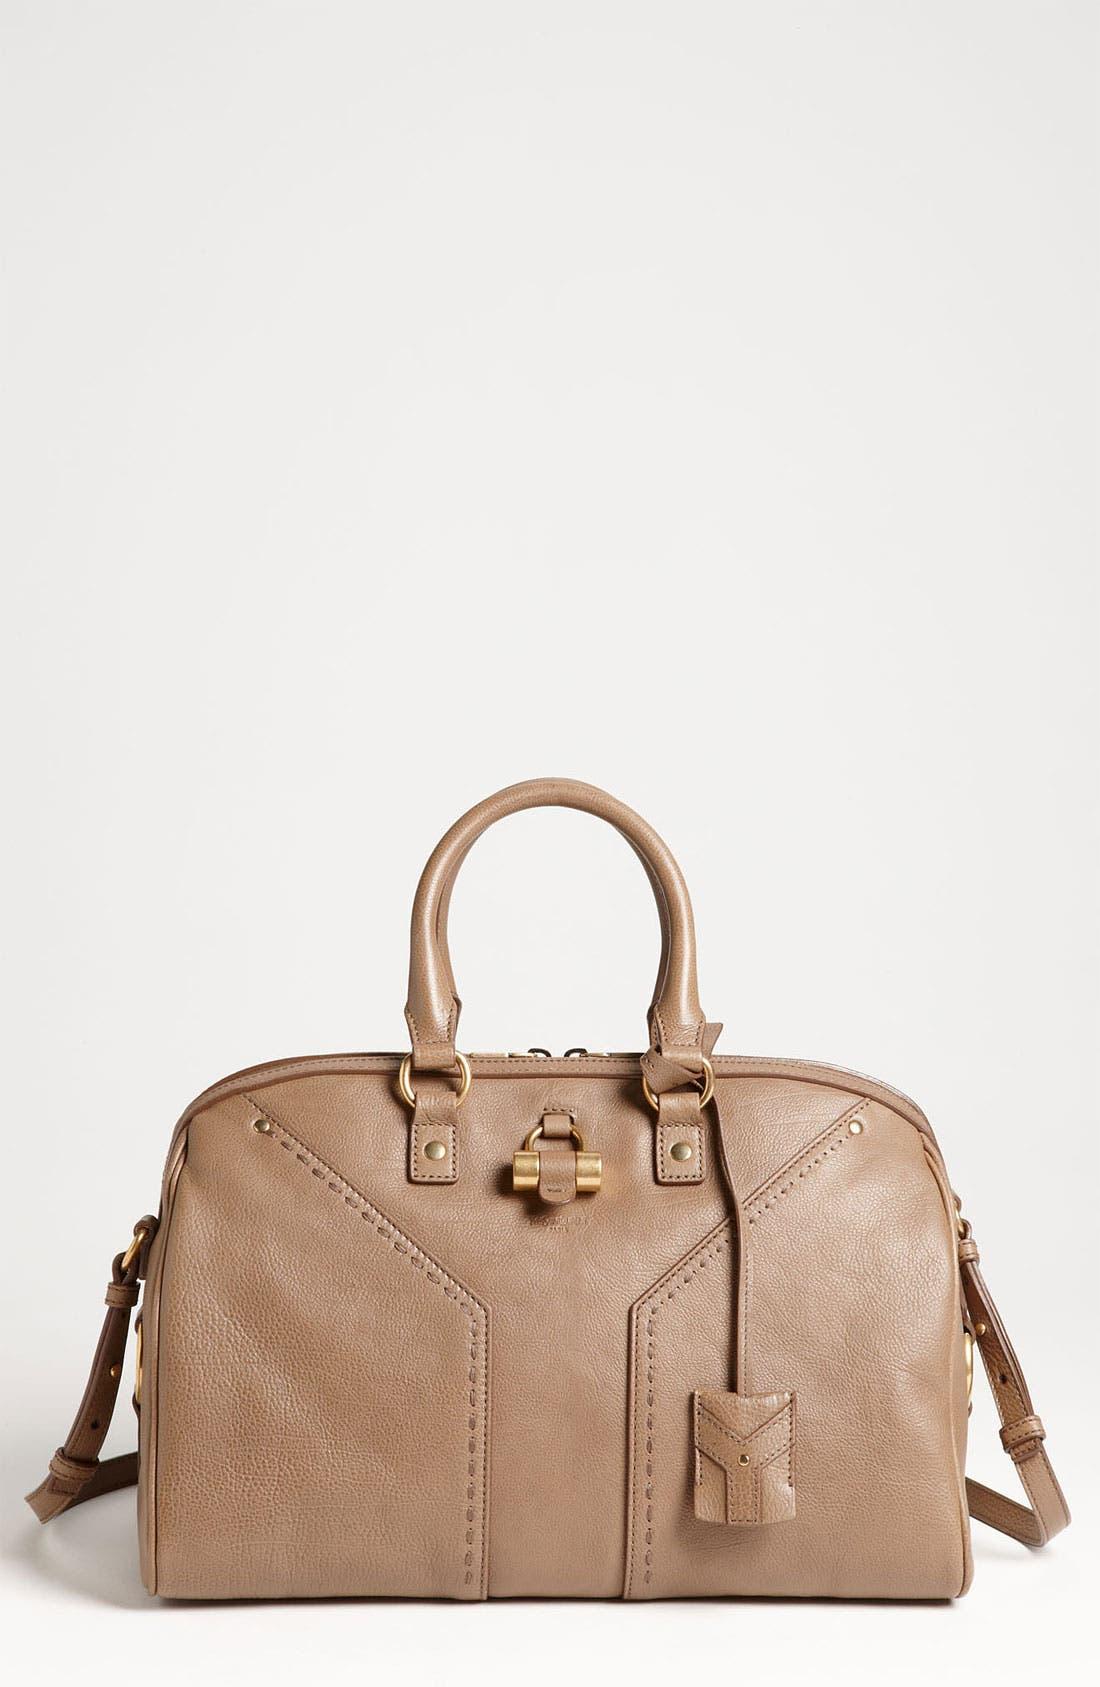 Main Image - Yves Saint Laurent 'Muse' Leather Satchel